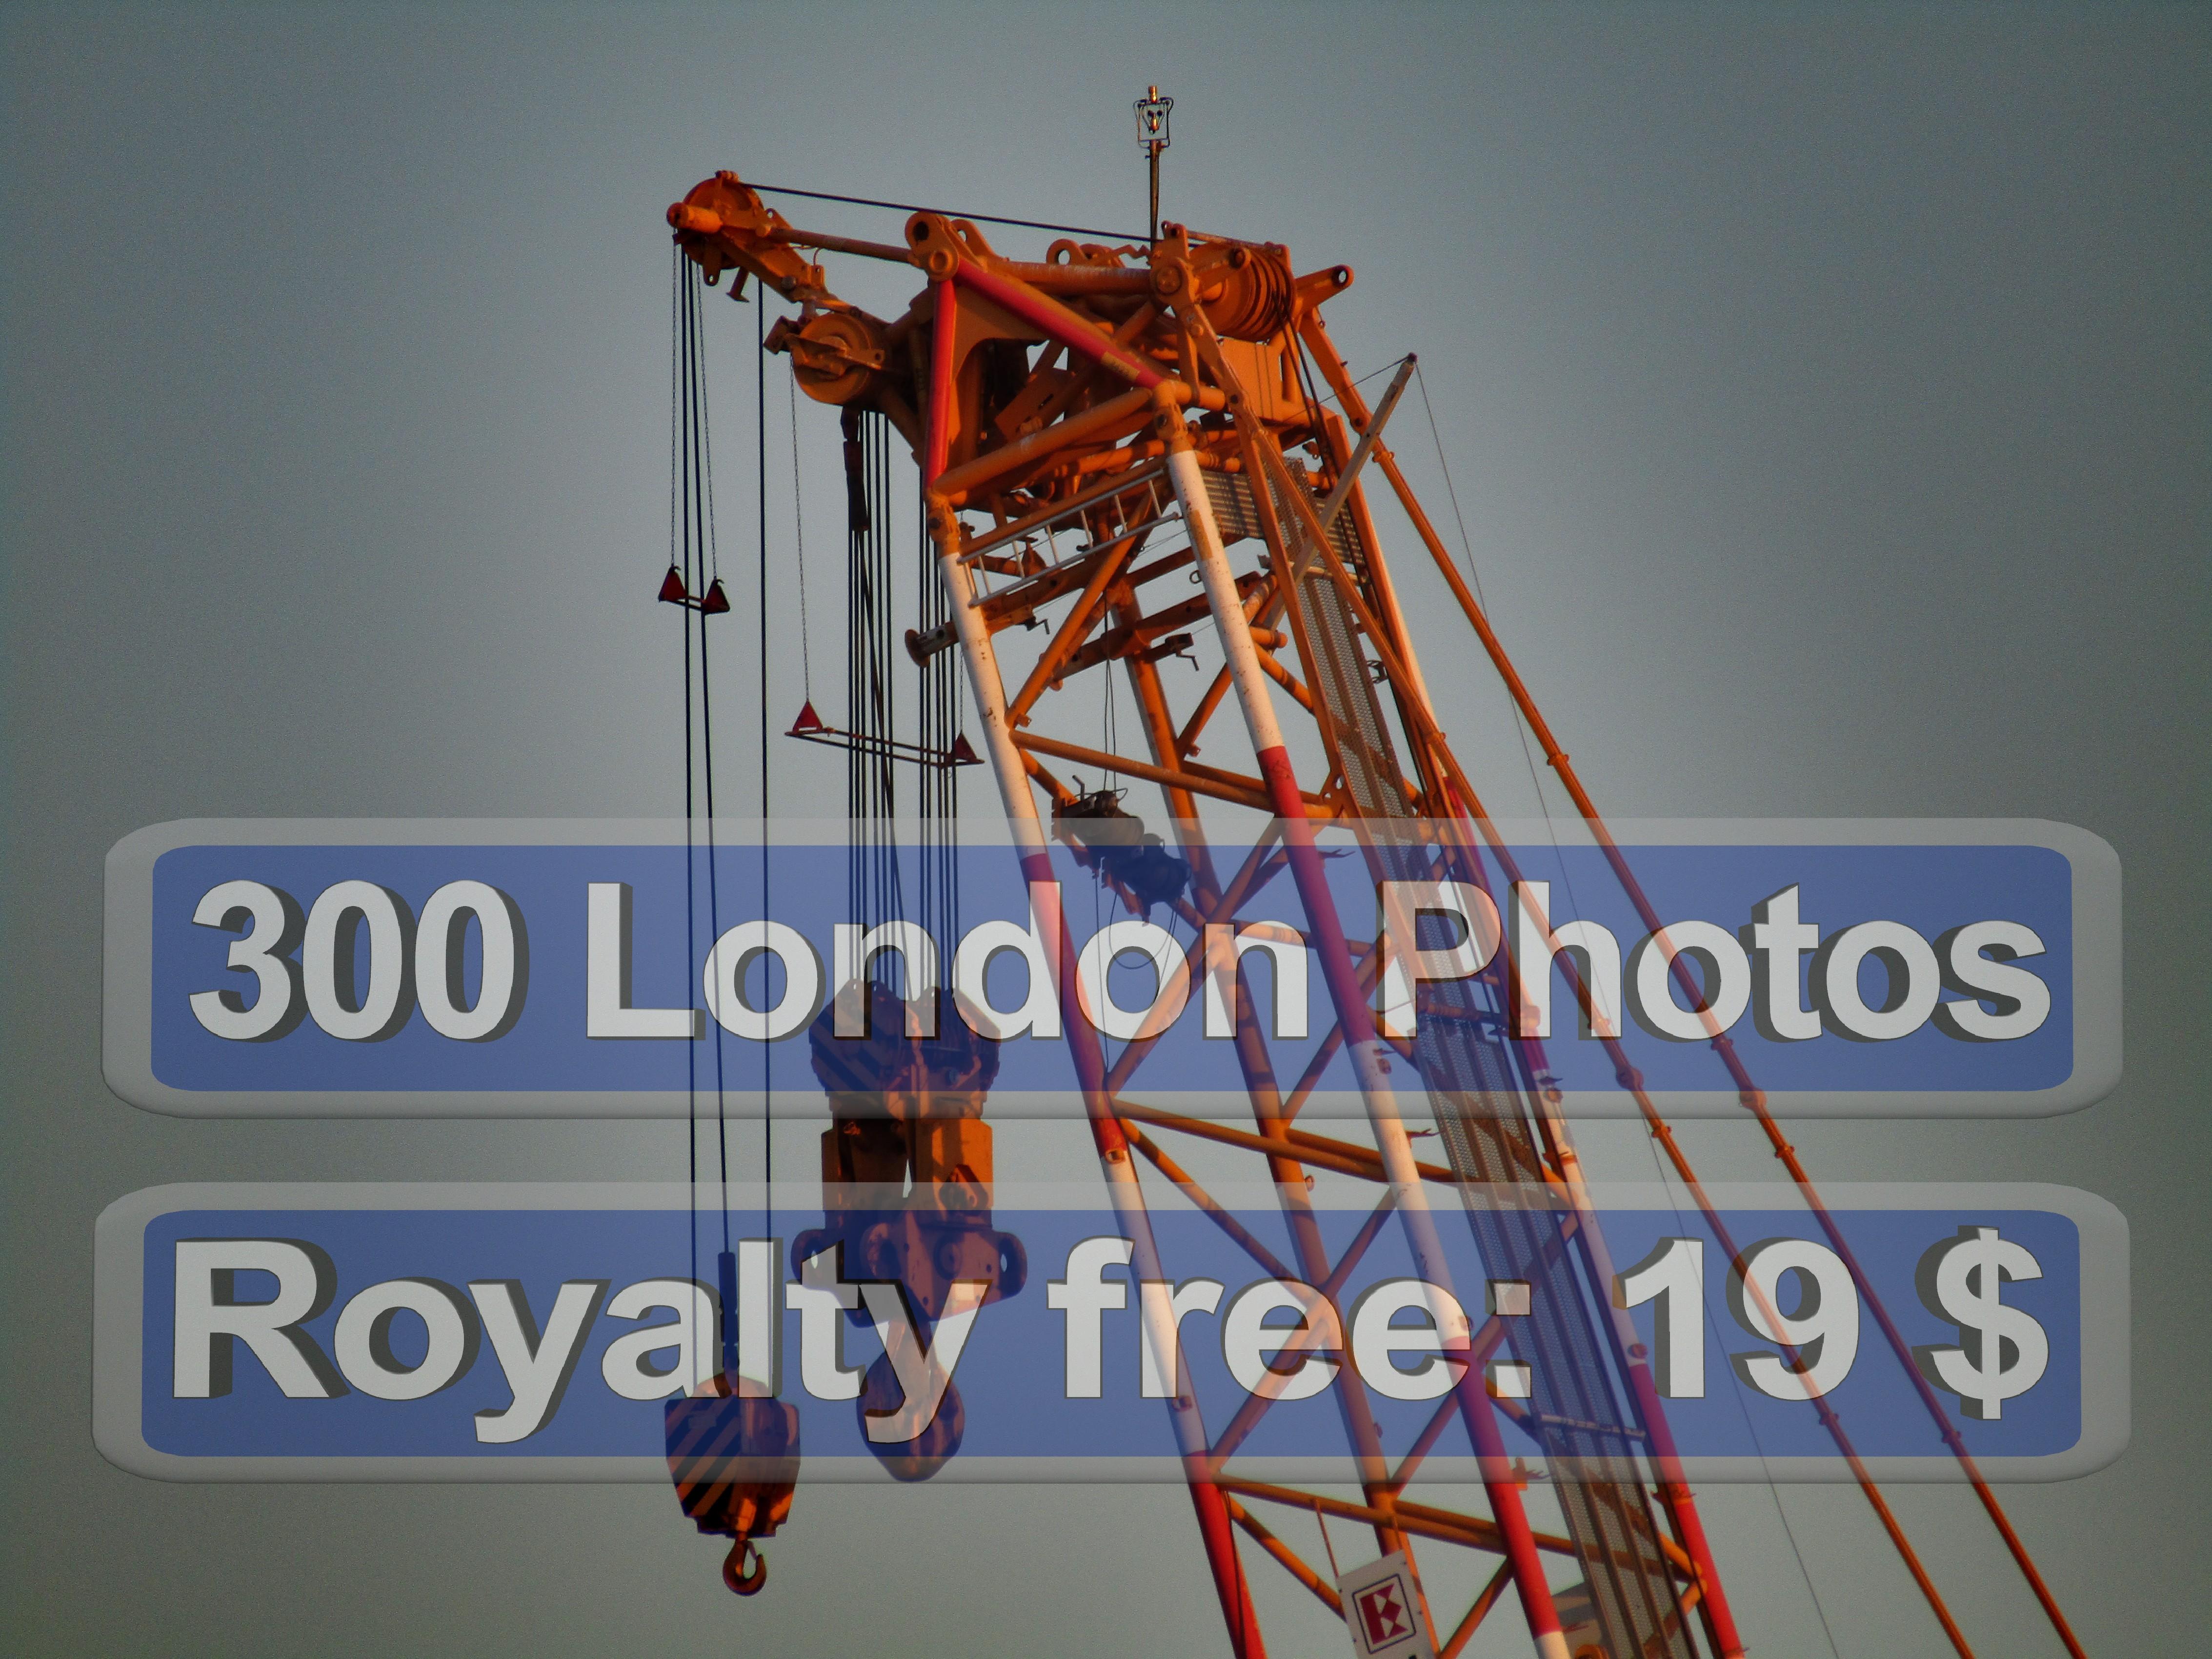 London Drugs Photo Pick Up